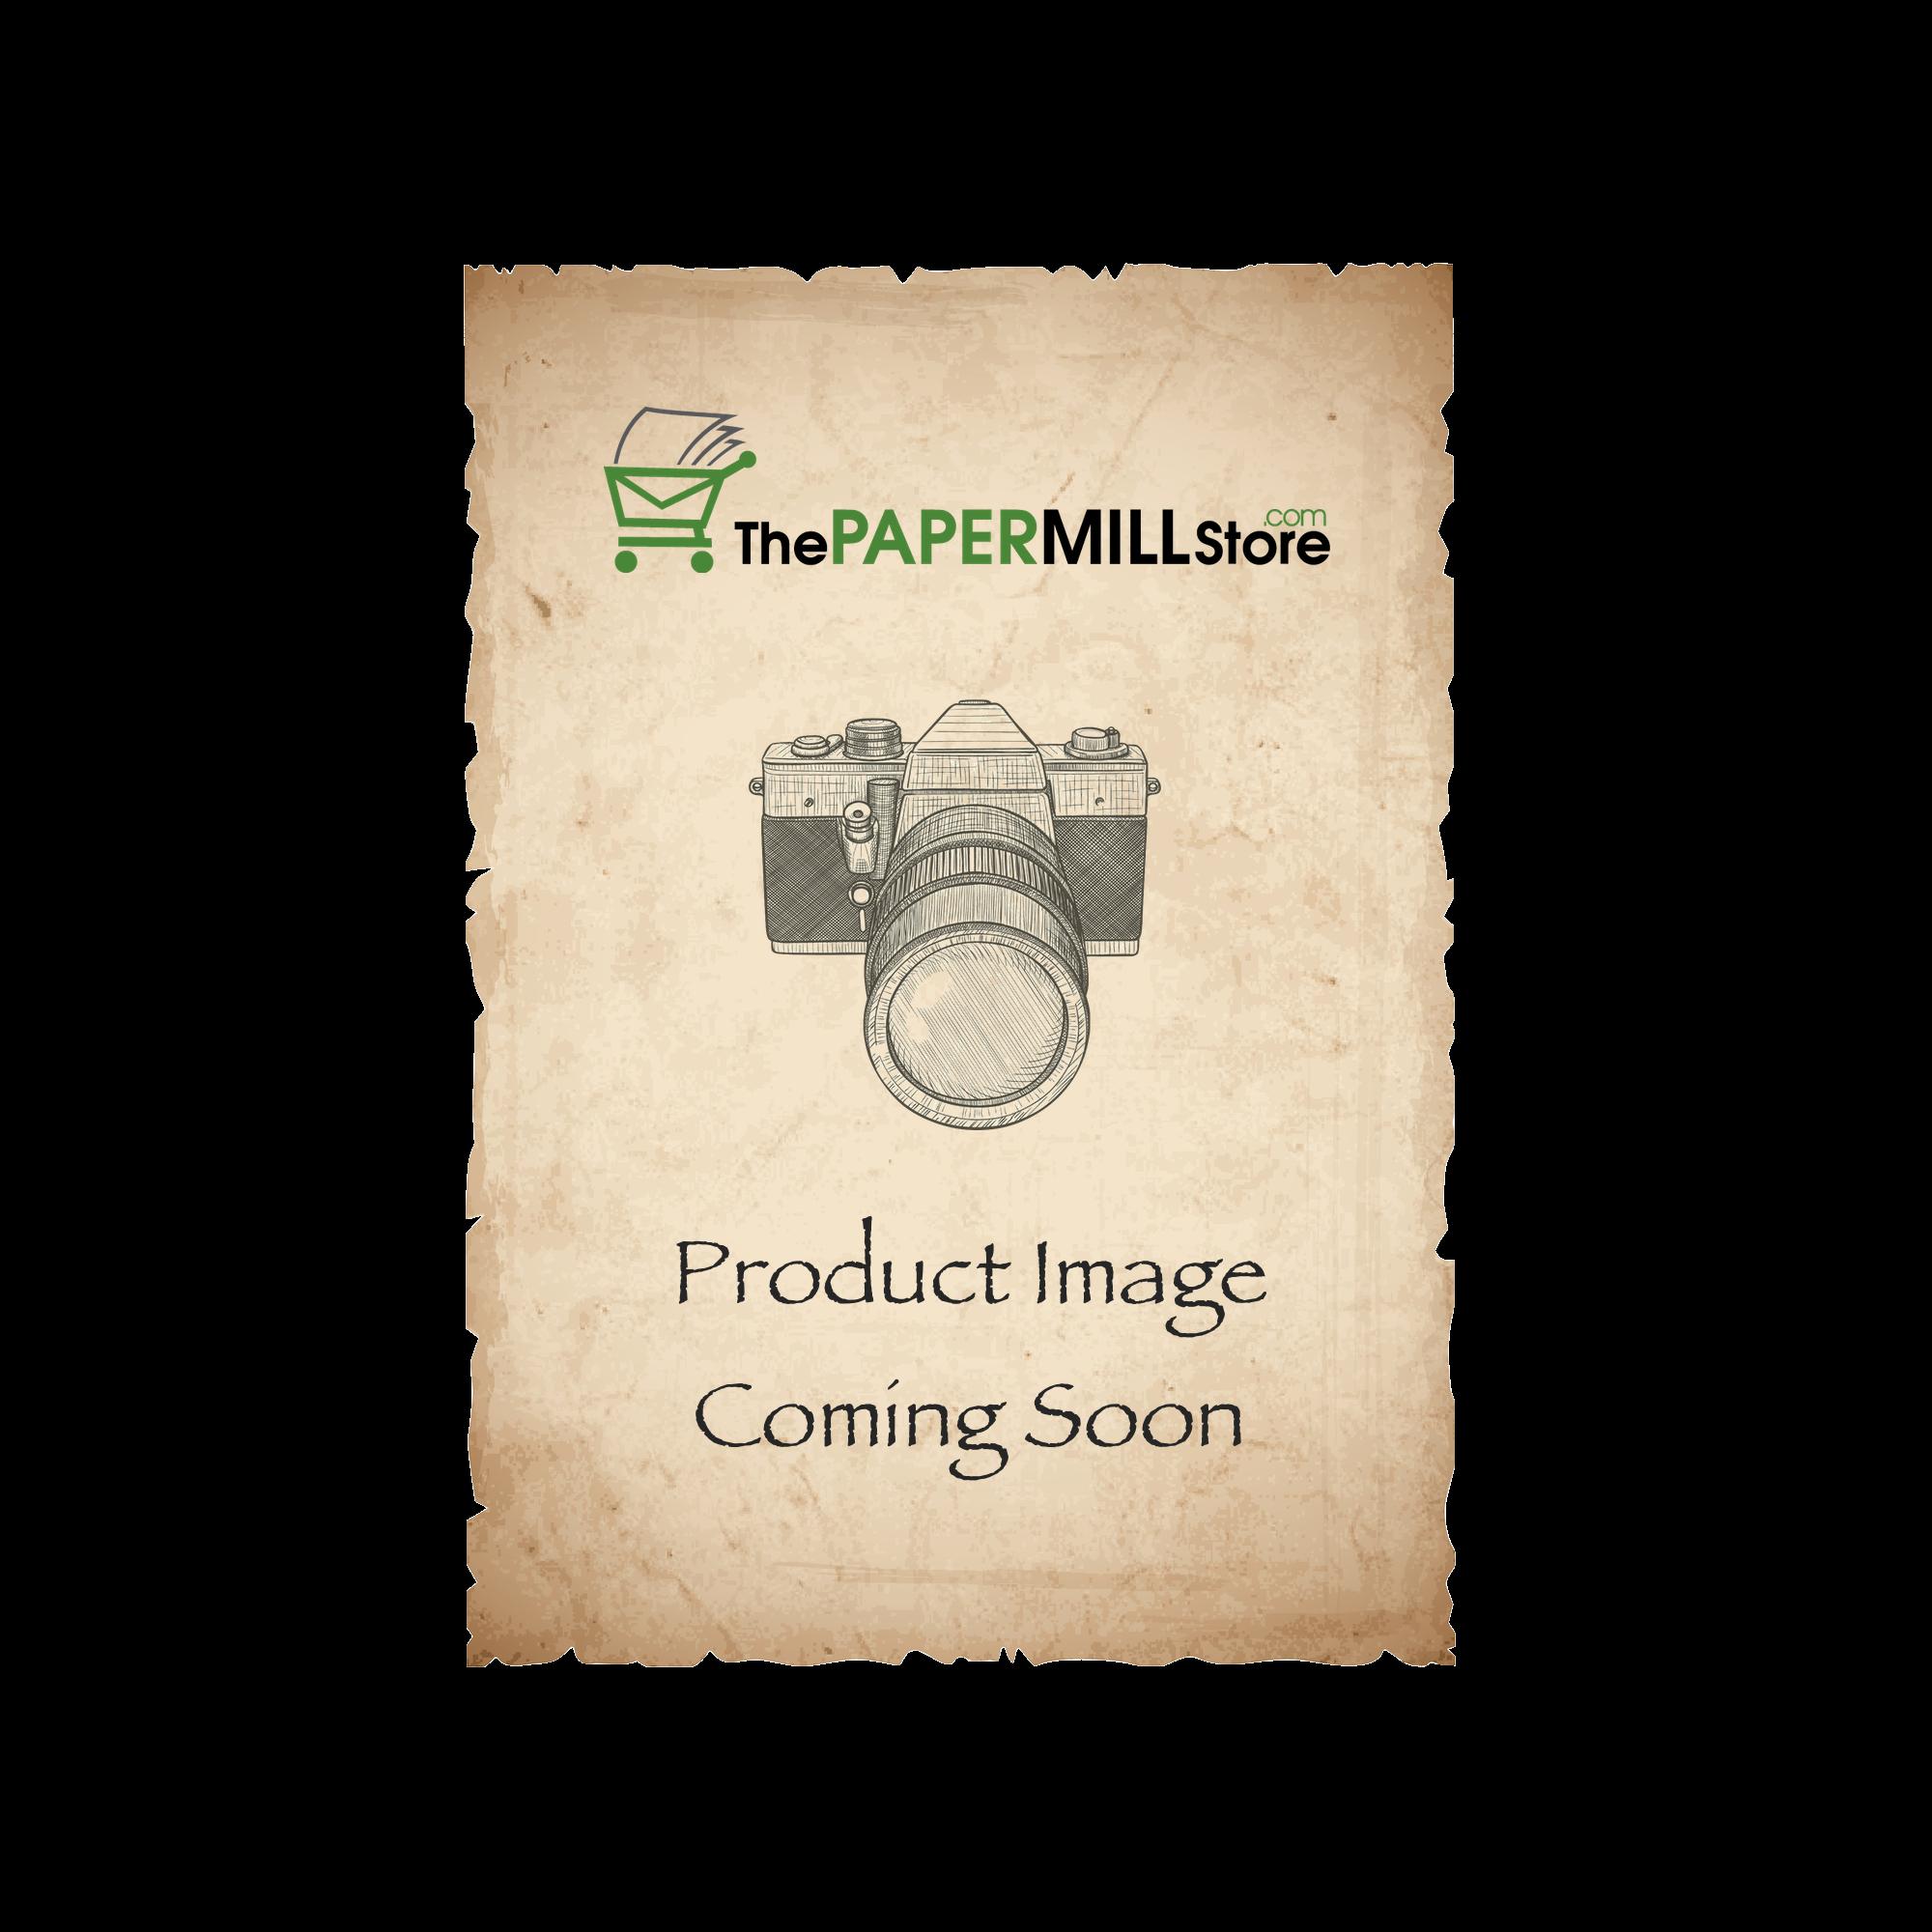 Ultrafelt Cool White Envelopes - A6 (4 3/4 x 6 1/2) 80 lb Text Premium Felt  30% Recycled 250 per Box